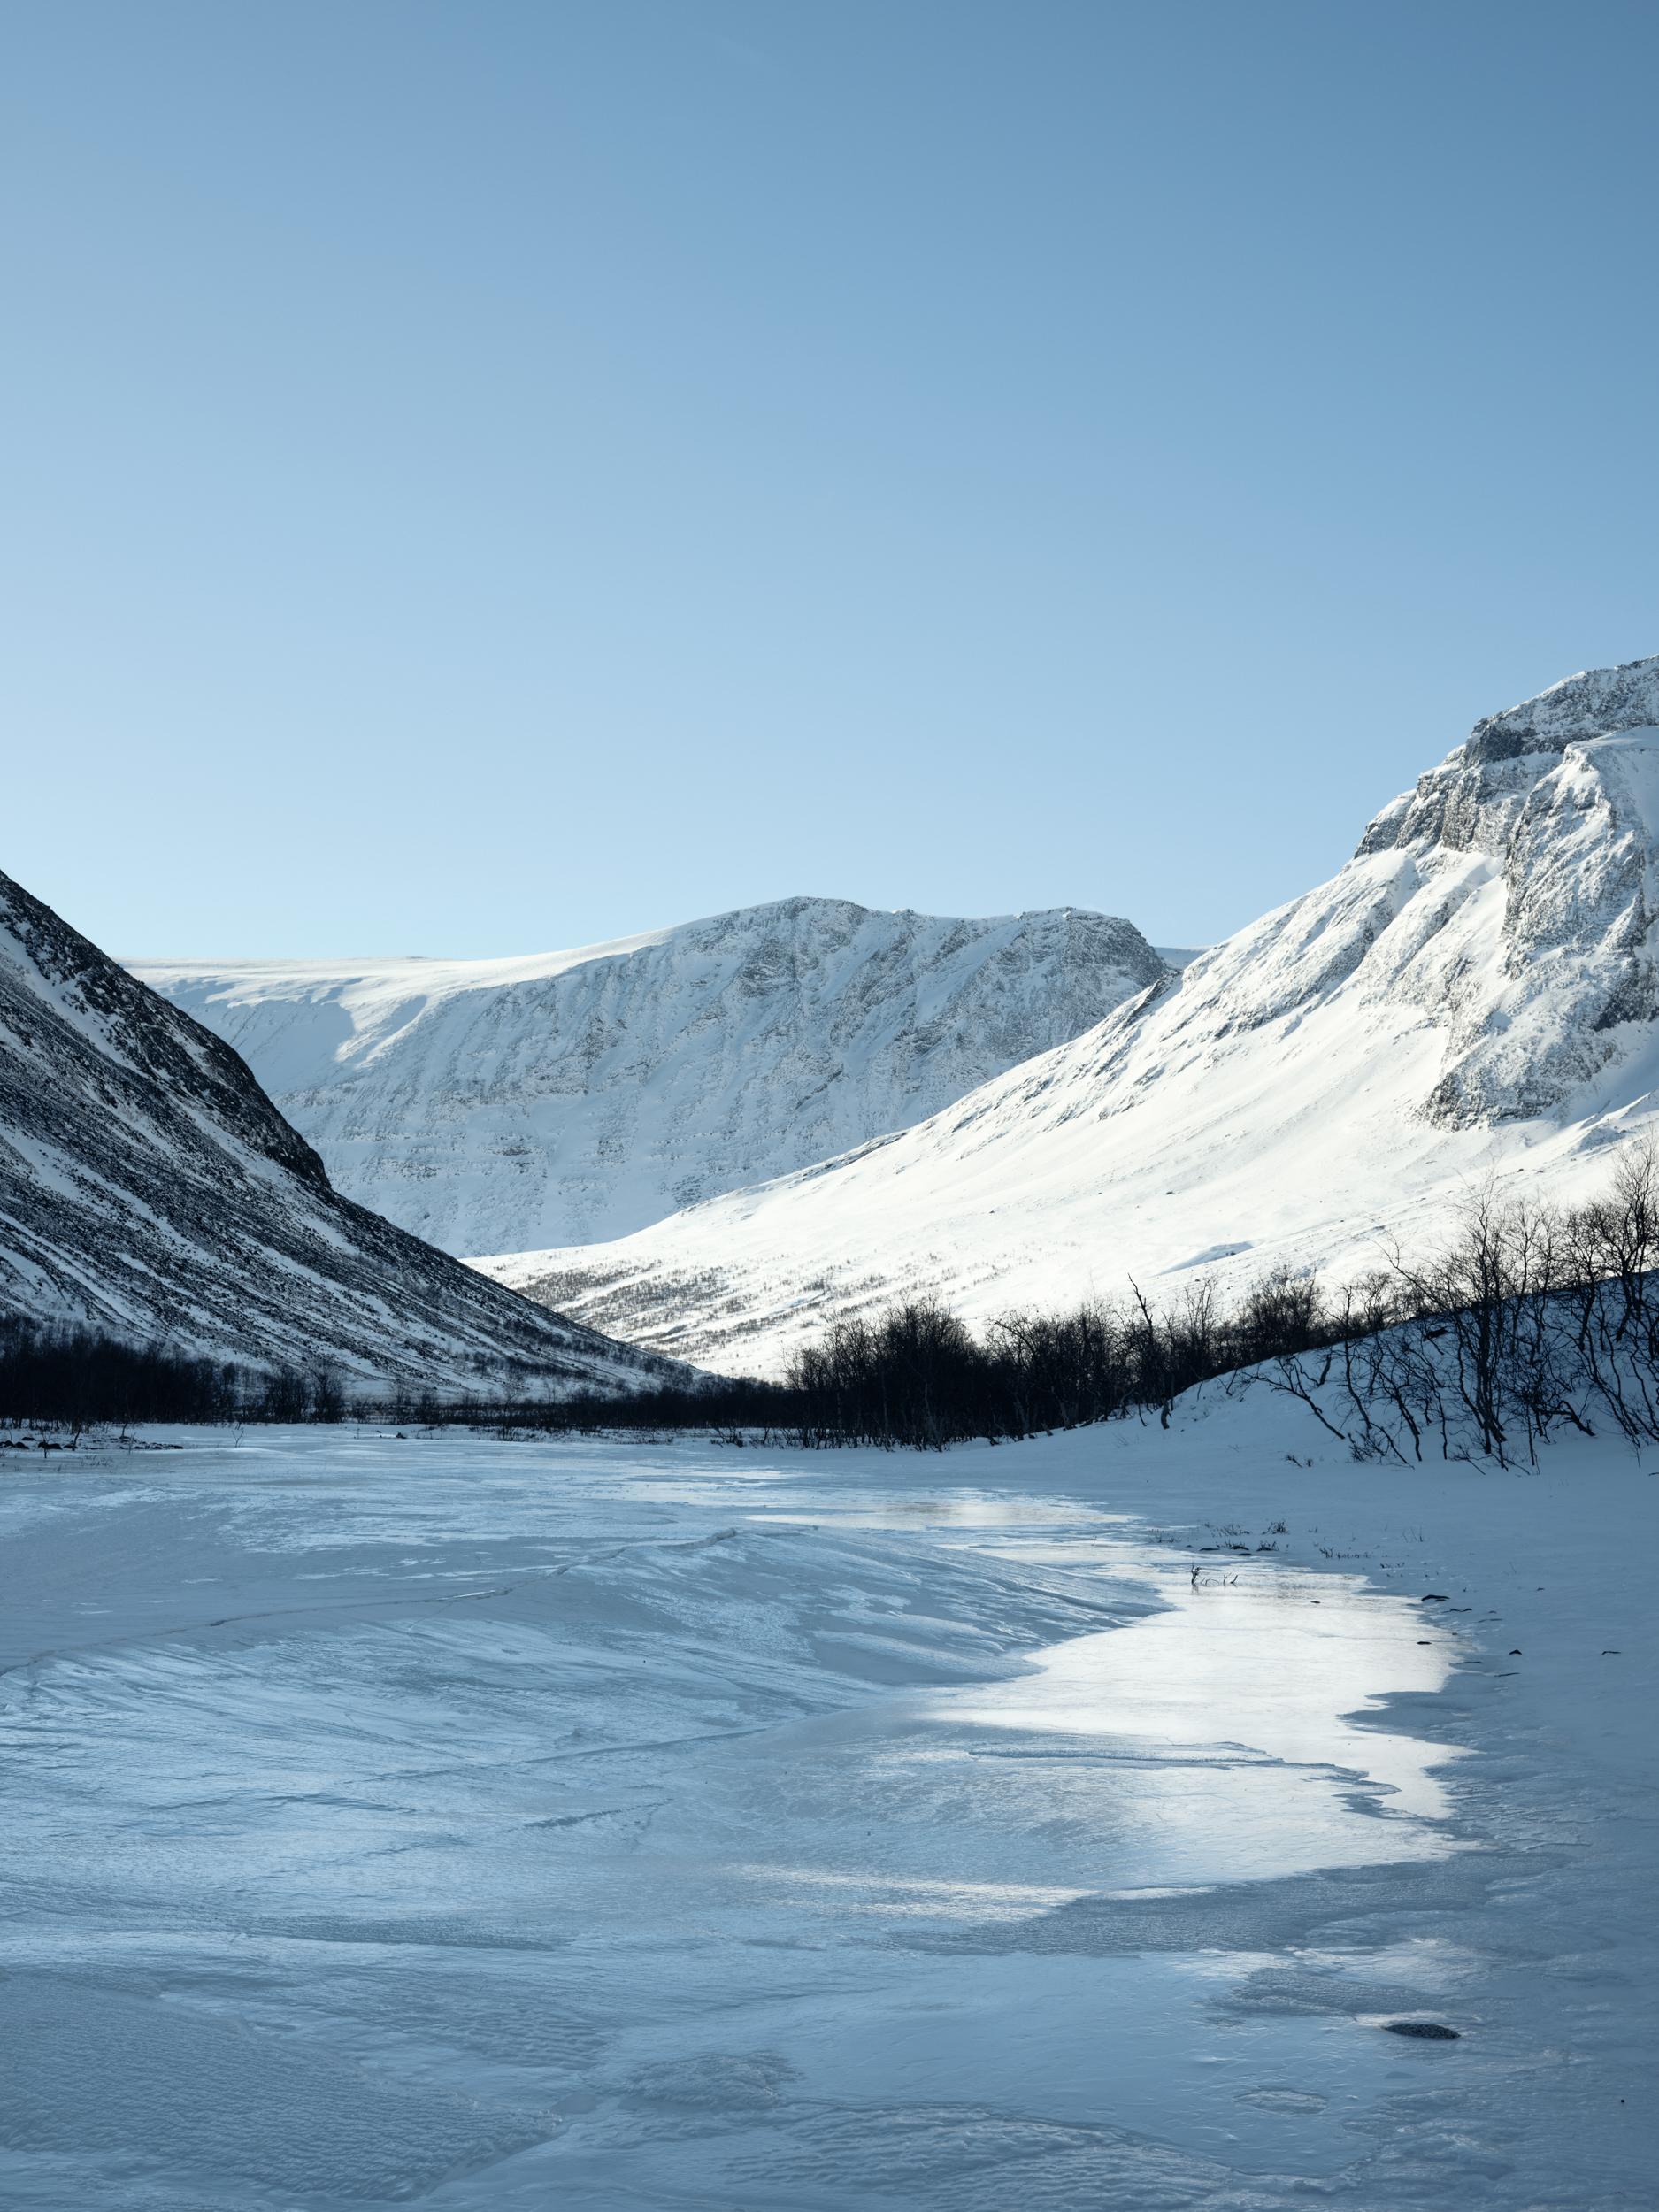 sgeo_20190329_Lappland_Winter_635.jpg